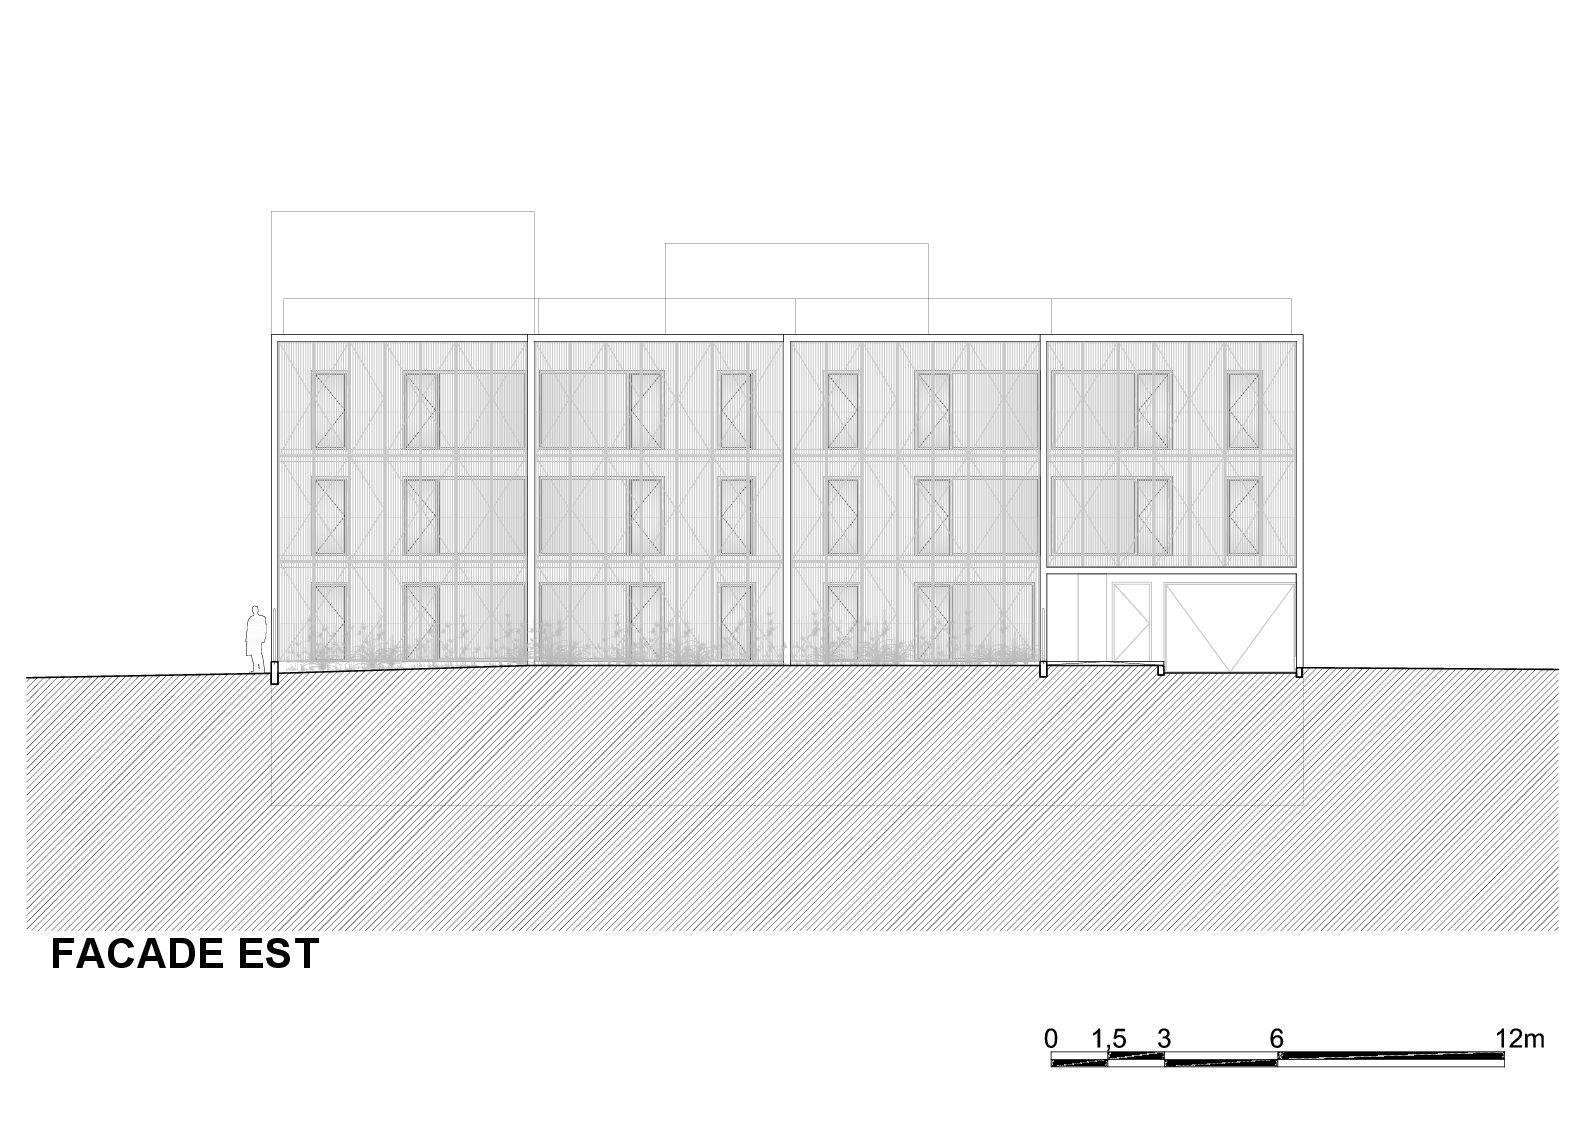 galer a de vivienda social tiendas en mouans sartoux comte et vollenweider architectes 43. Black Bedroom Furniture Sets. Home Design Ideas